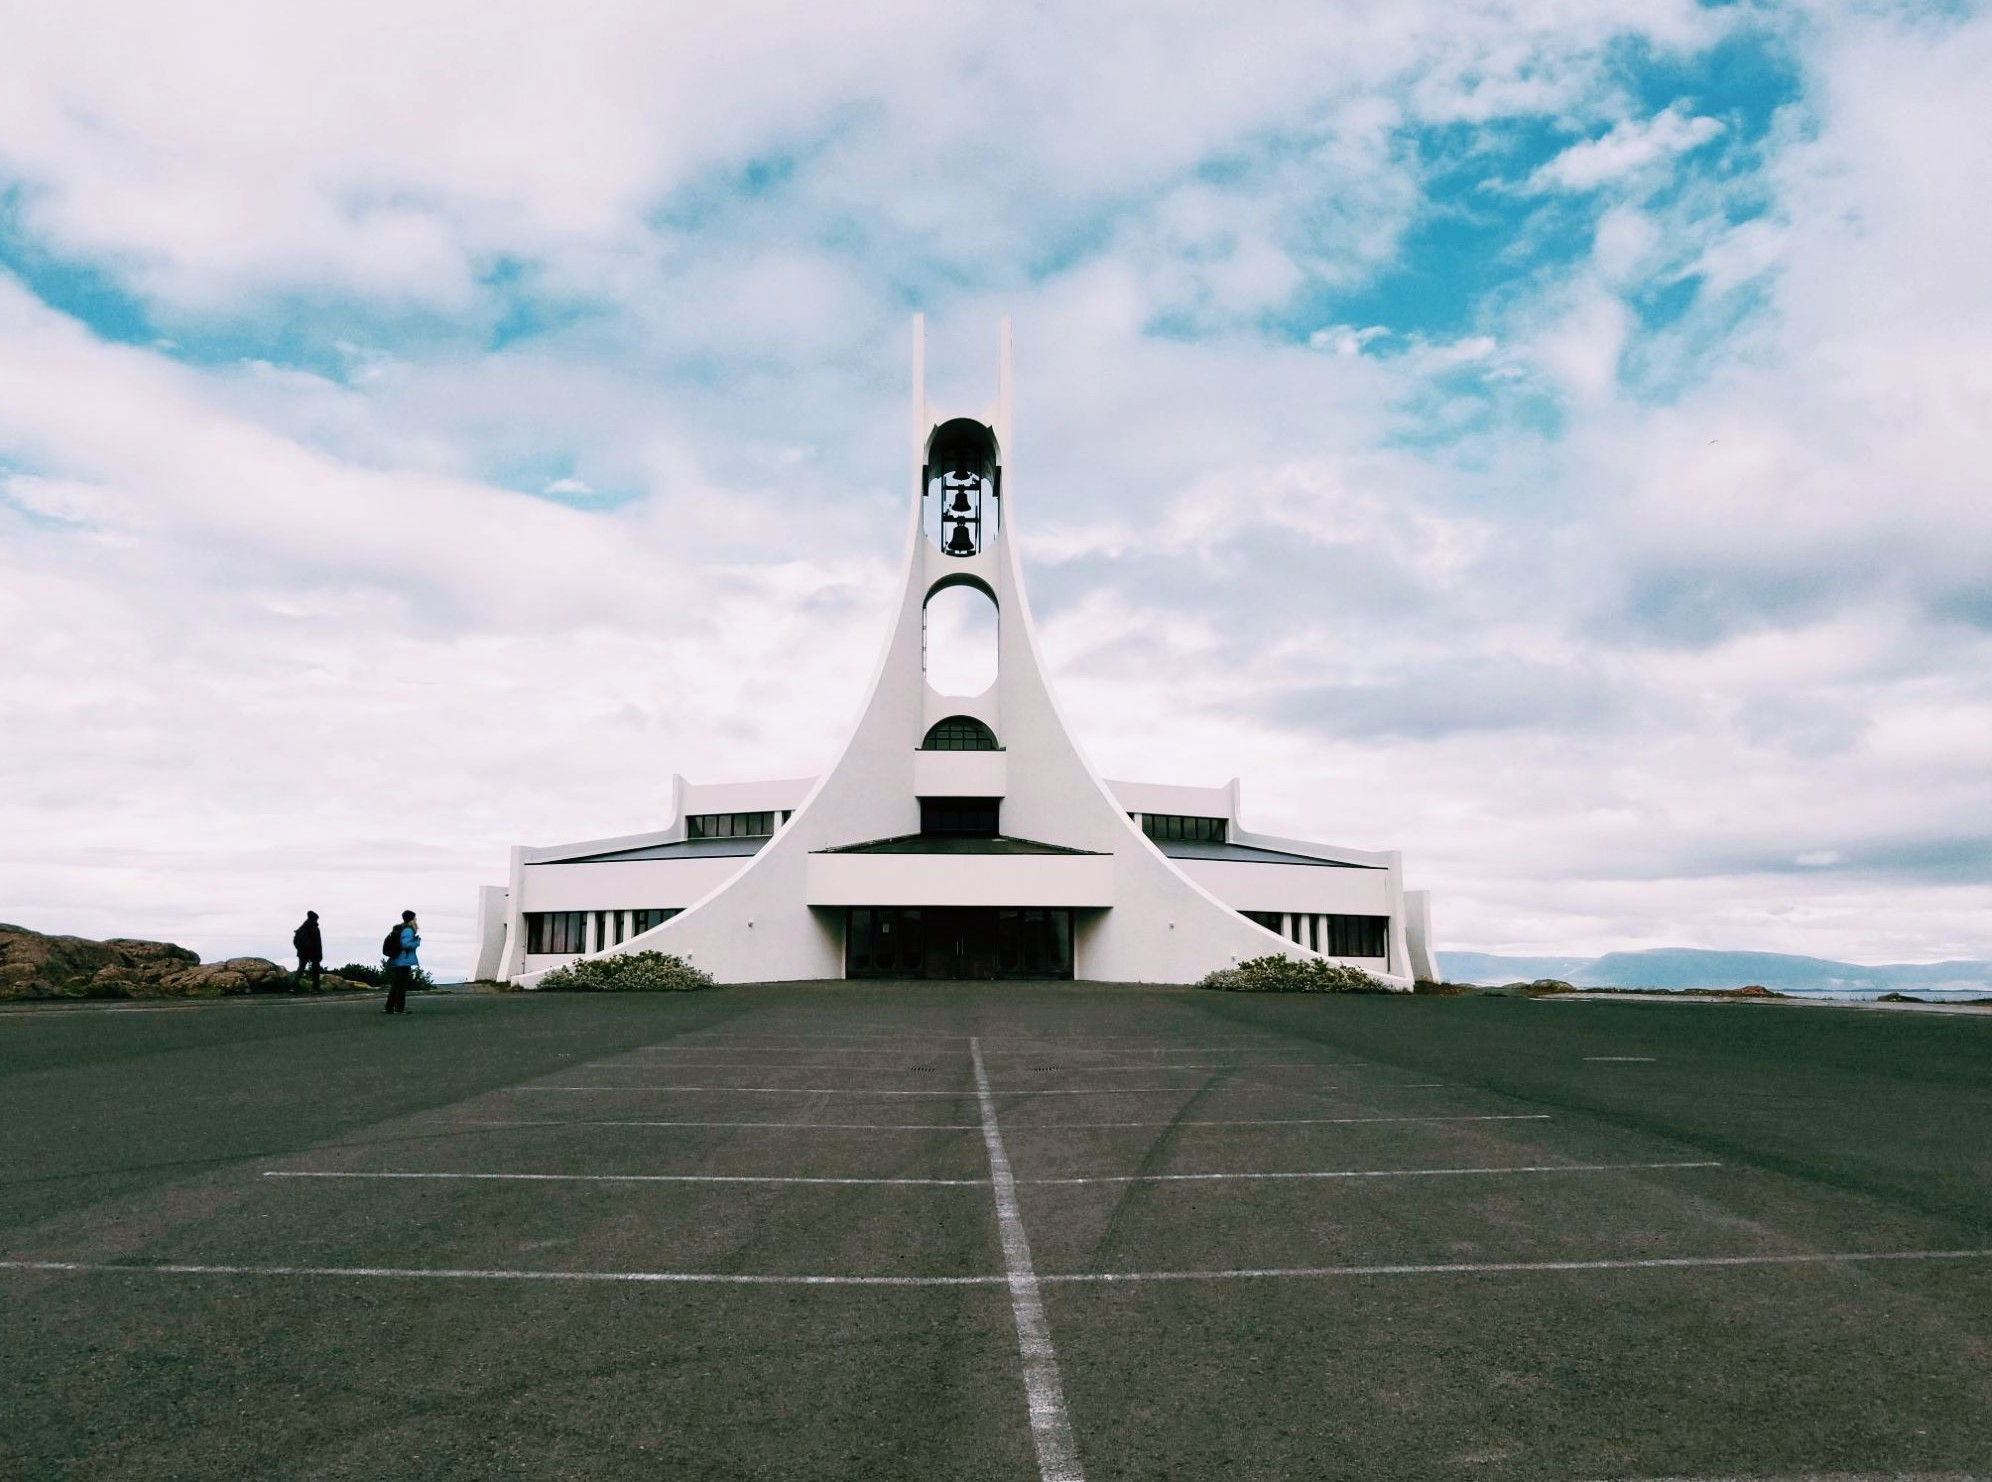 Църквата в Stykkisholmur